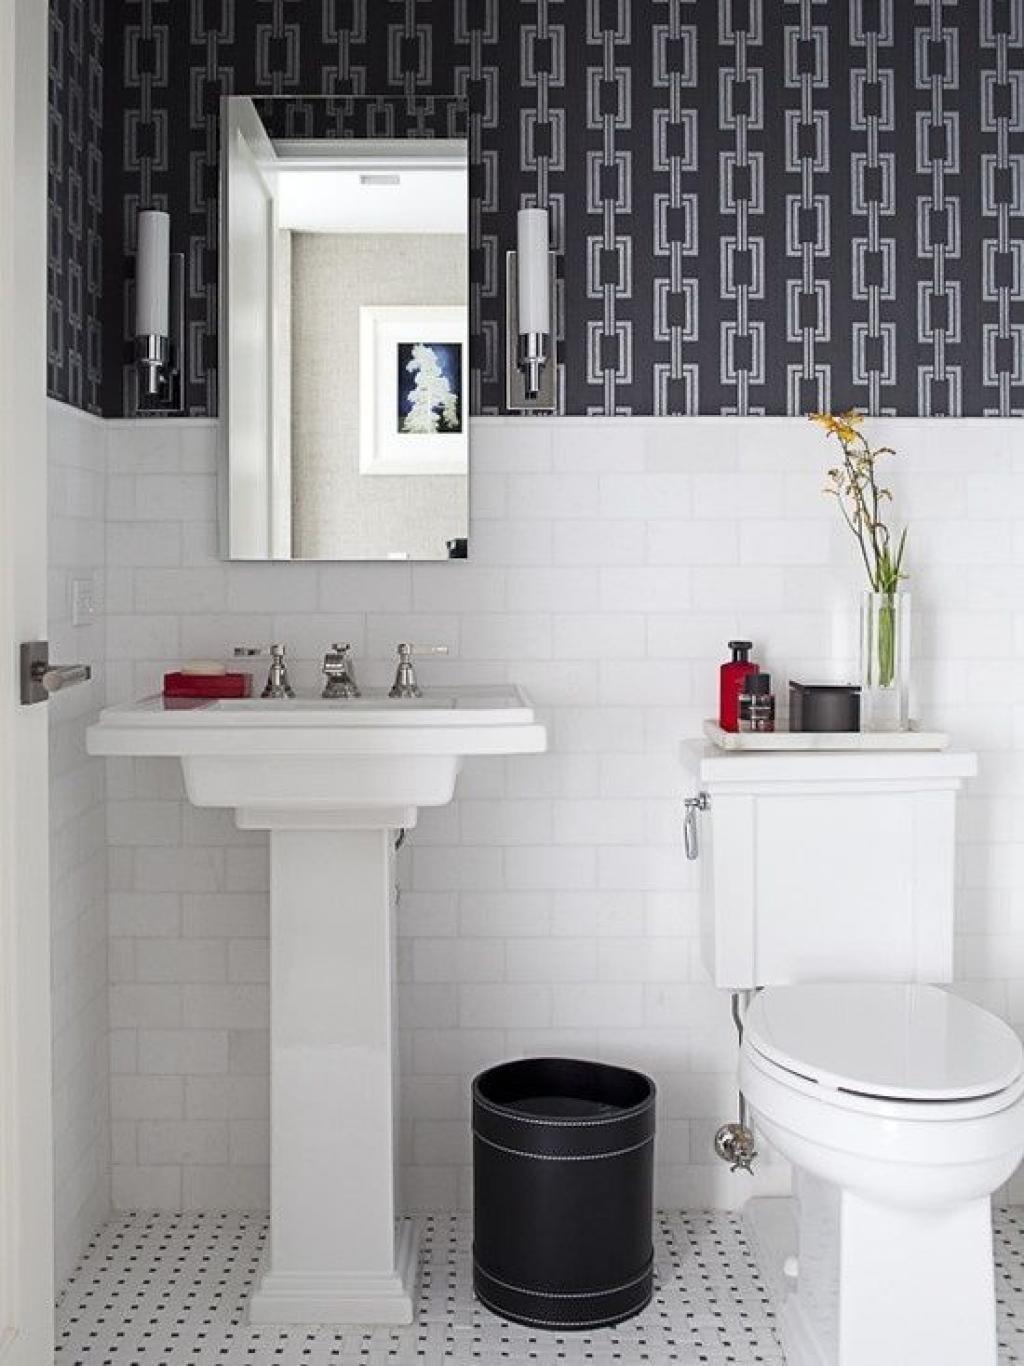 Black and white small bathroom - Creative Black And White Small Bathroom With Chains Bathroom Wallpaper Ideas Home Inspiring